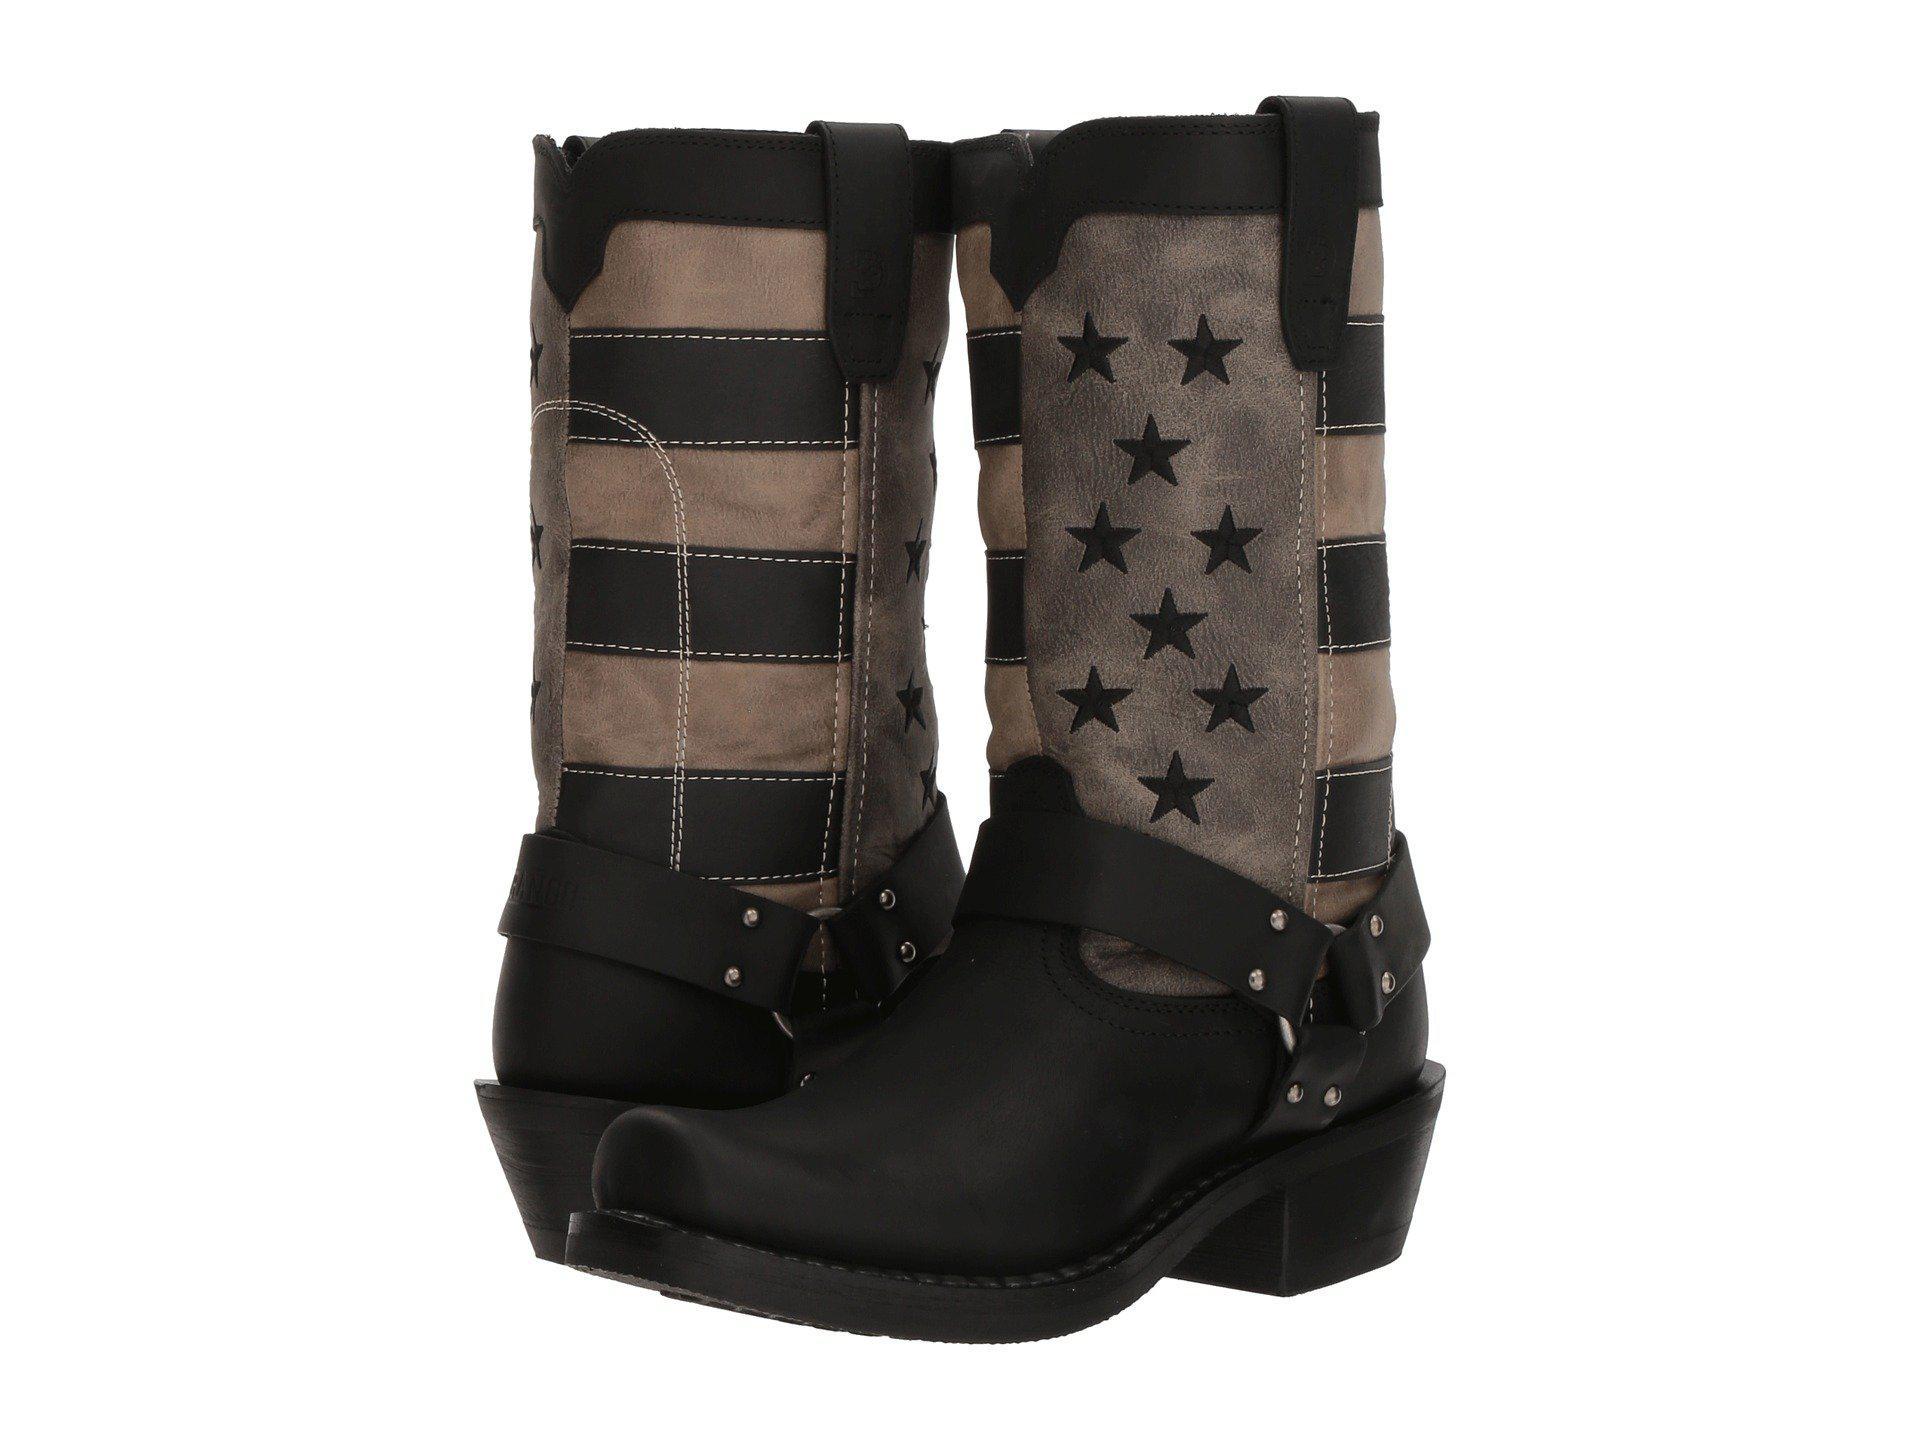 e0871cc3863 Lyst - Durango Flag Harness Boot 11 (black/charcoal/grey) Cowboy ...